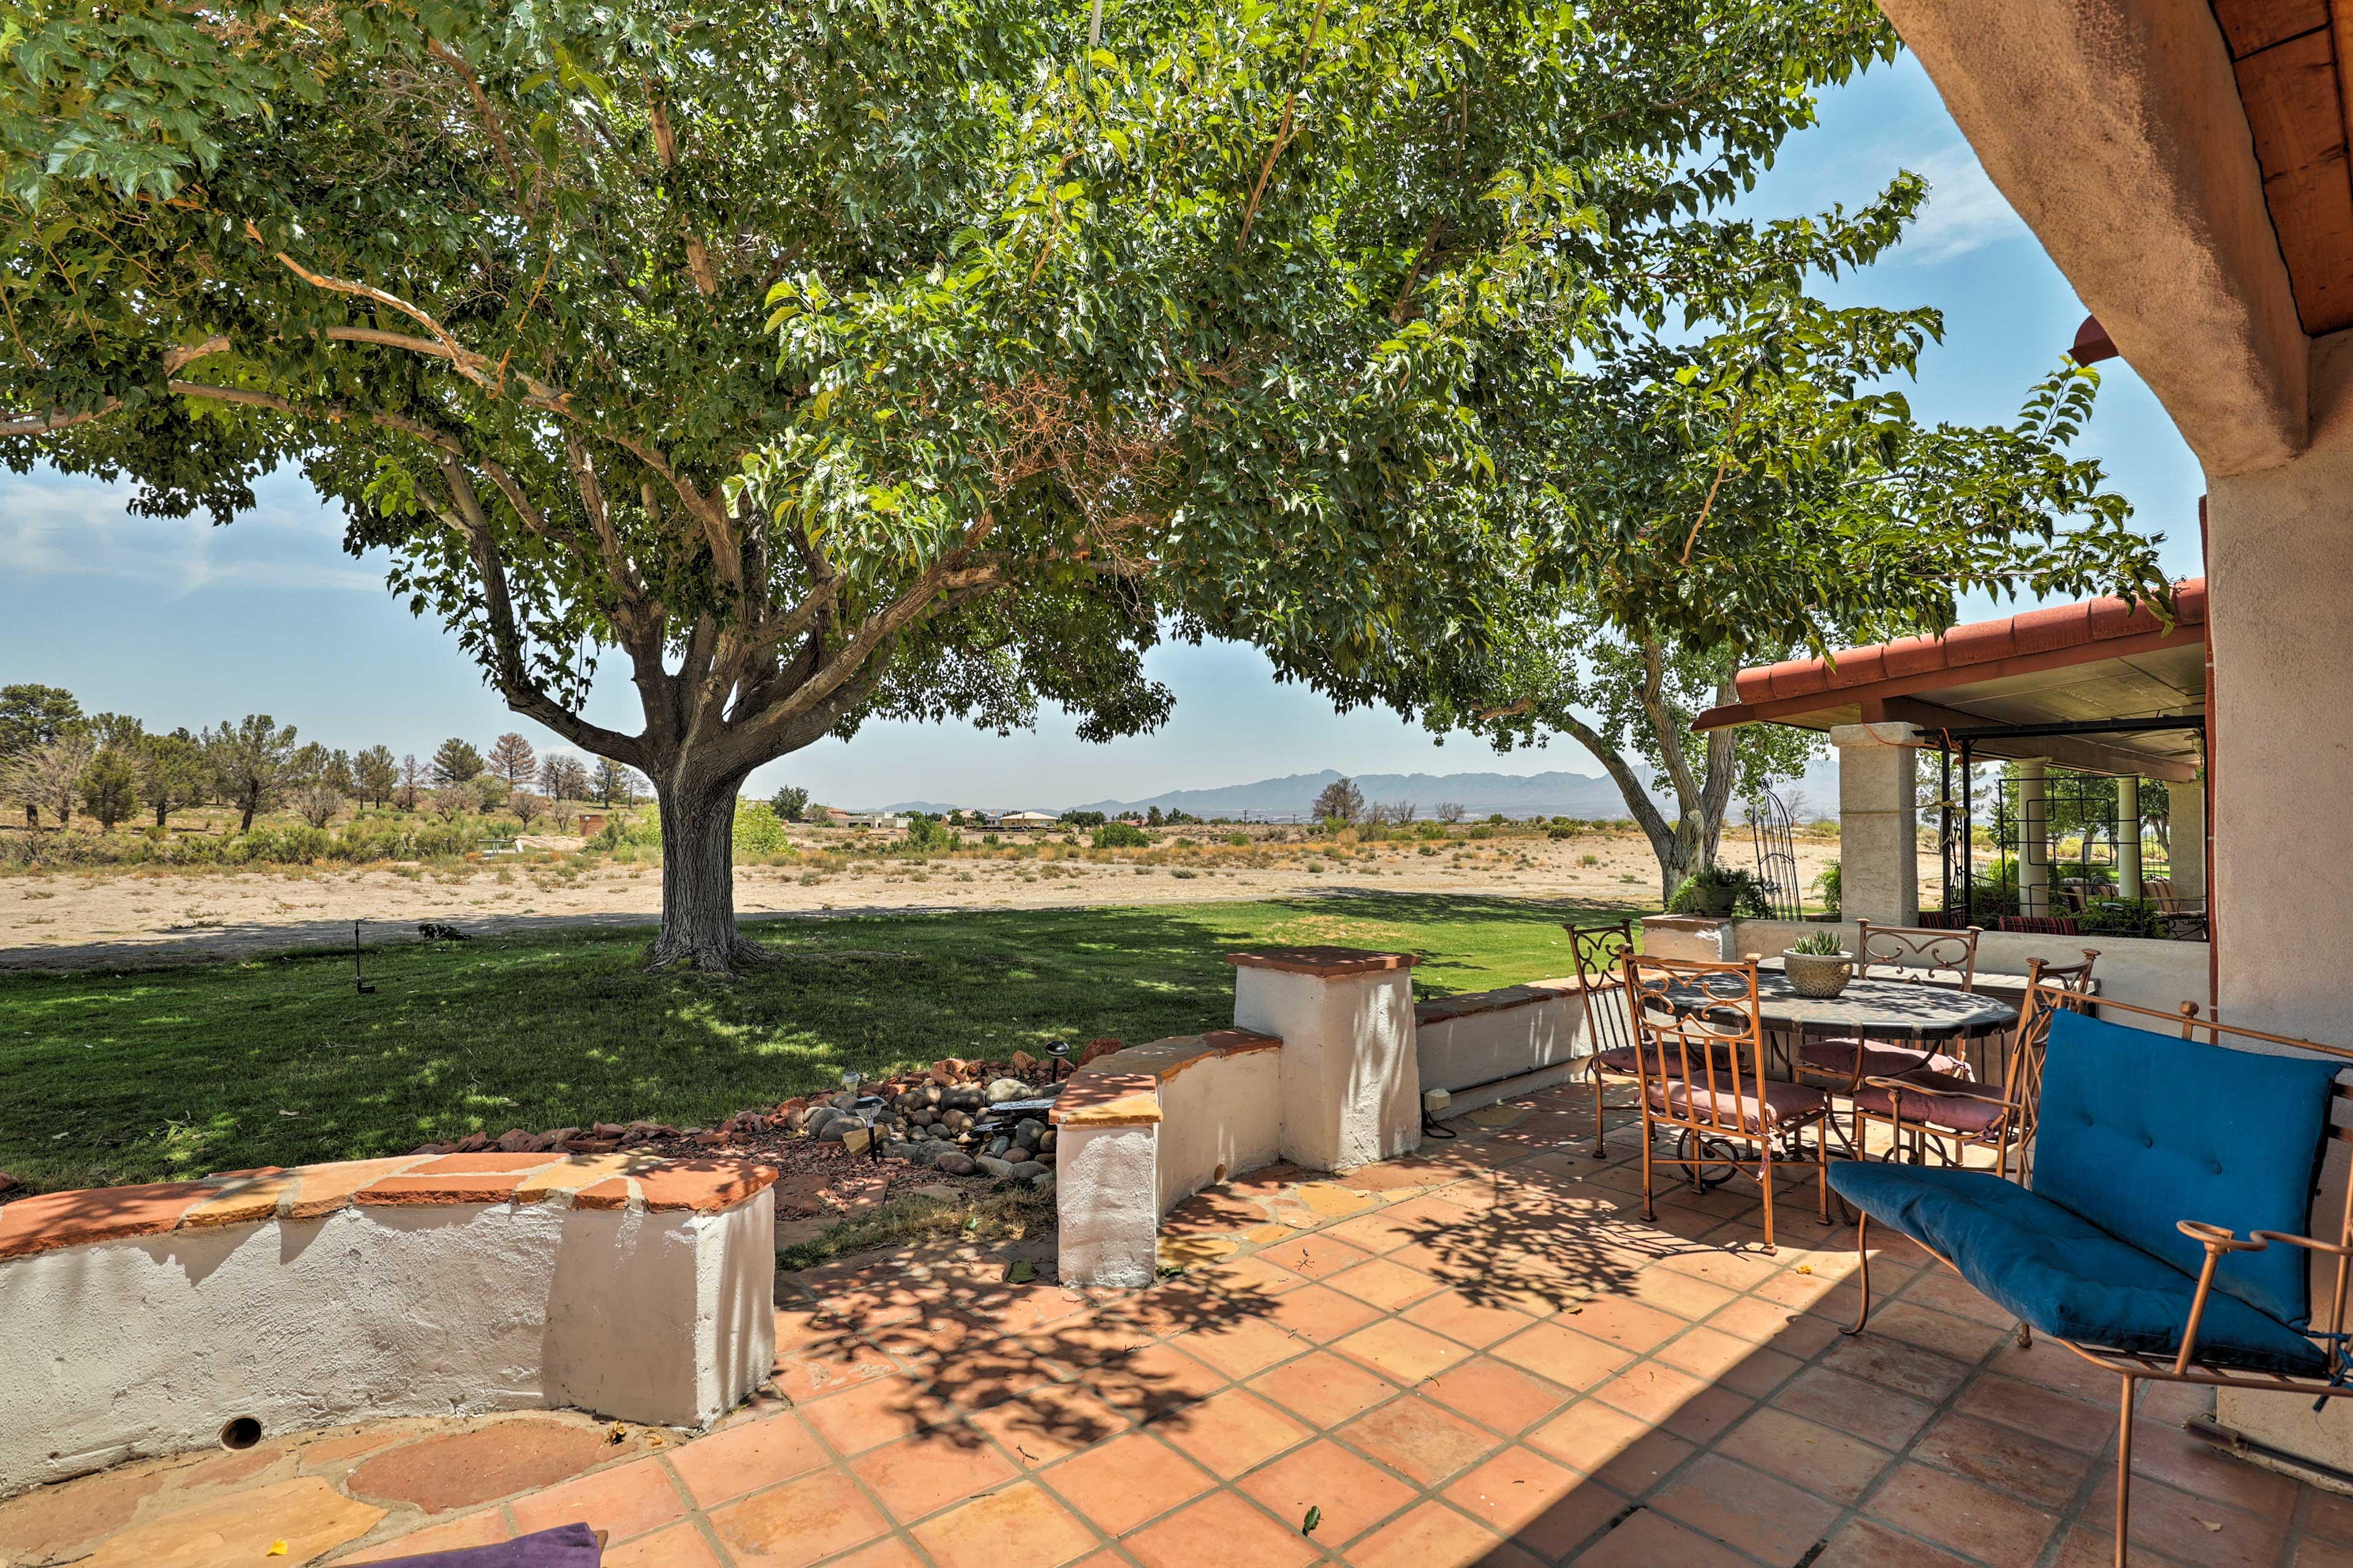 Dine al fresco on the second patio!